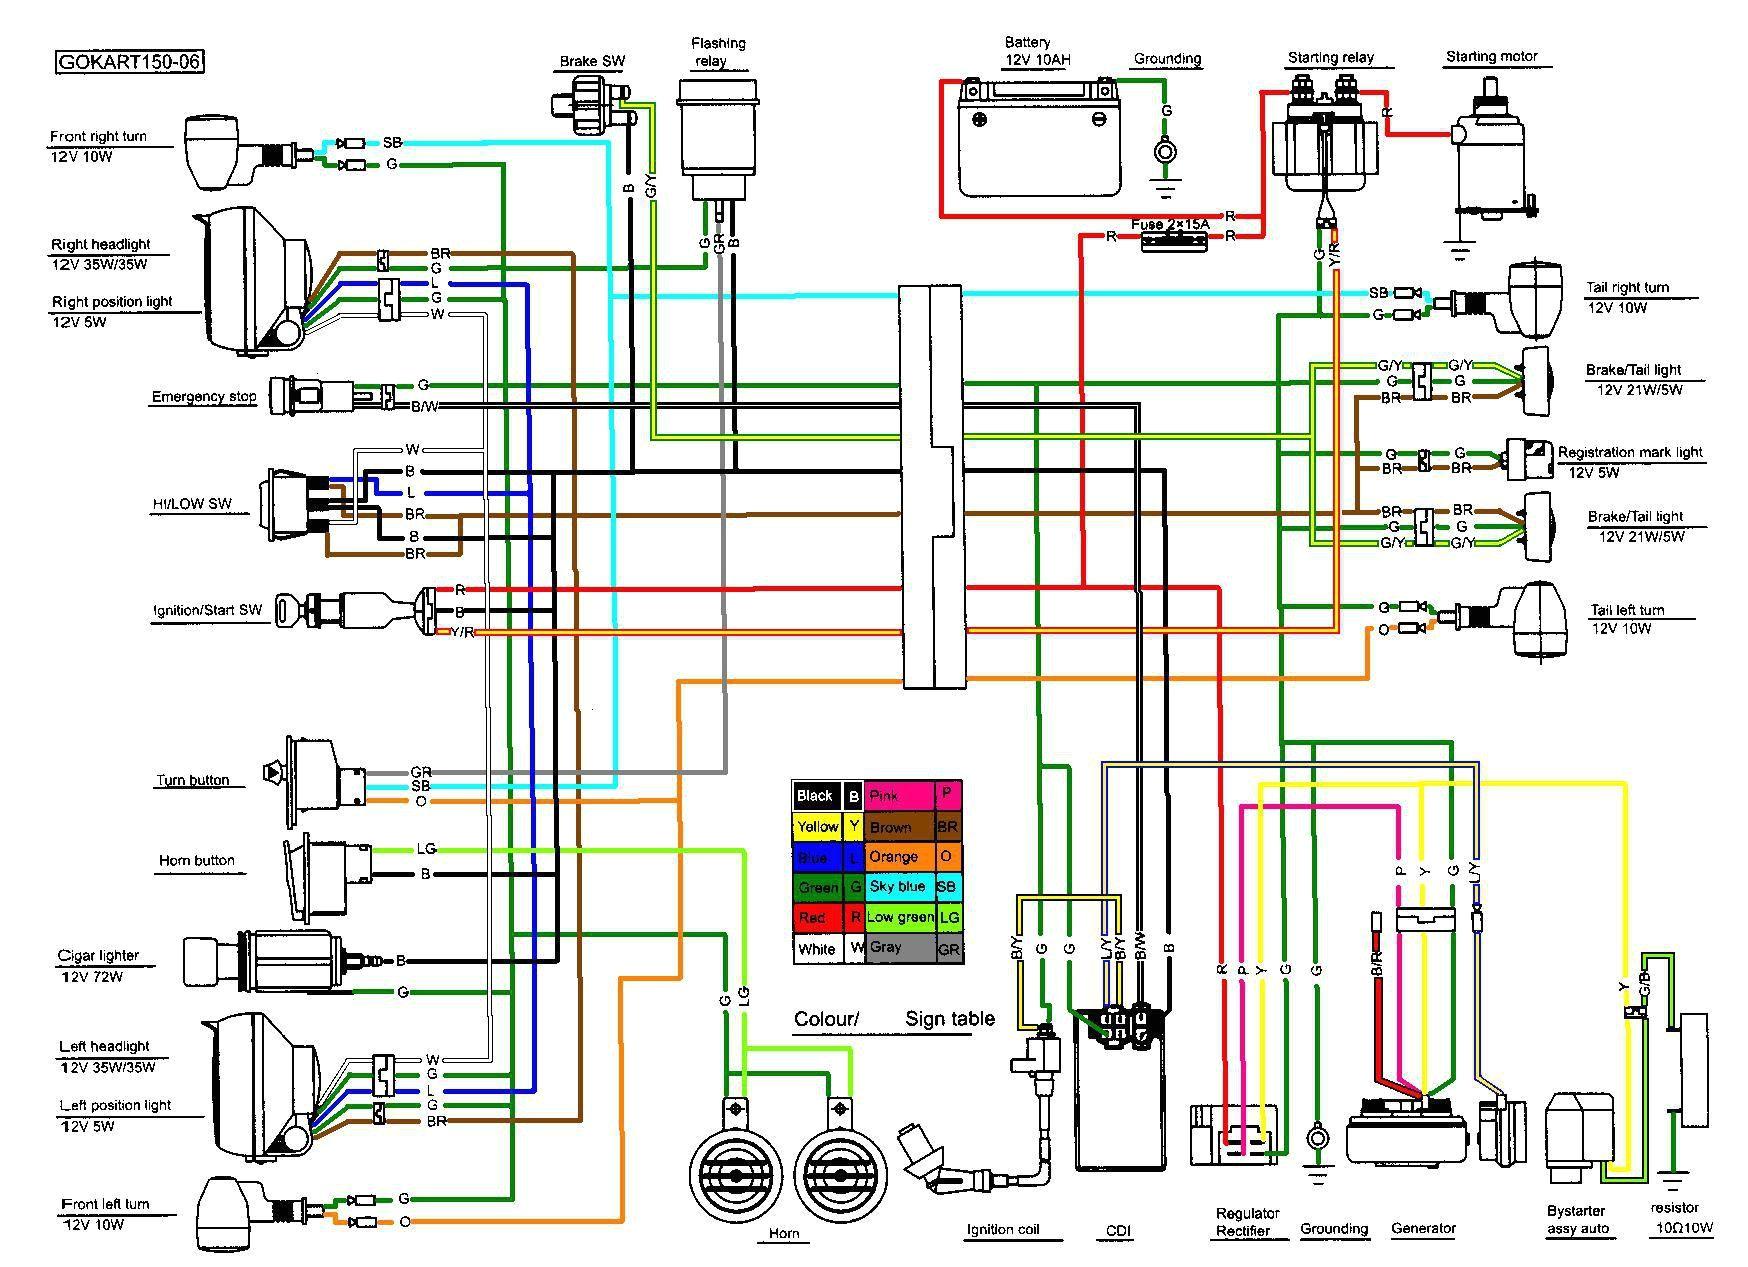 Kandi 150cc Go Kart Wiring Diagram 150cc Go Kart Wiring Diagram Best Of Gy6 Kandi Throughout